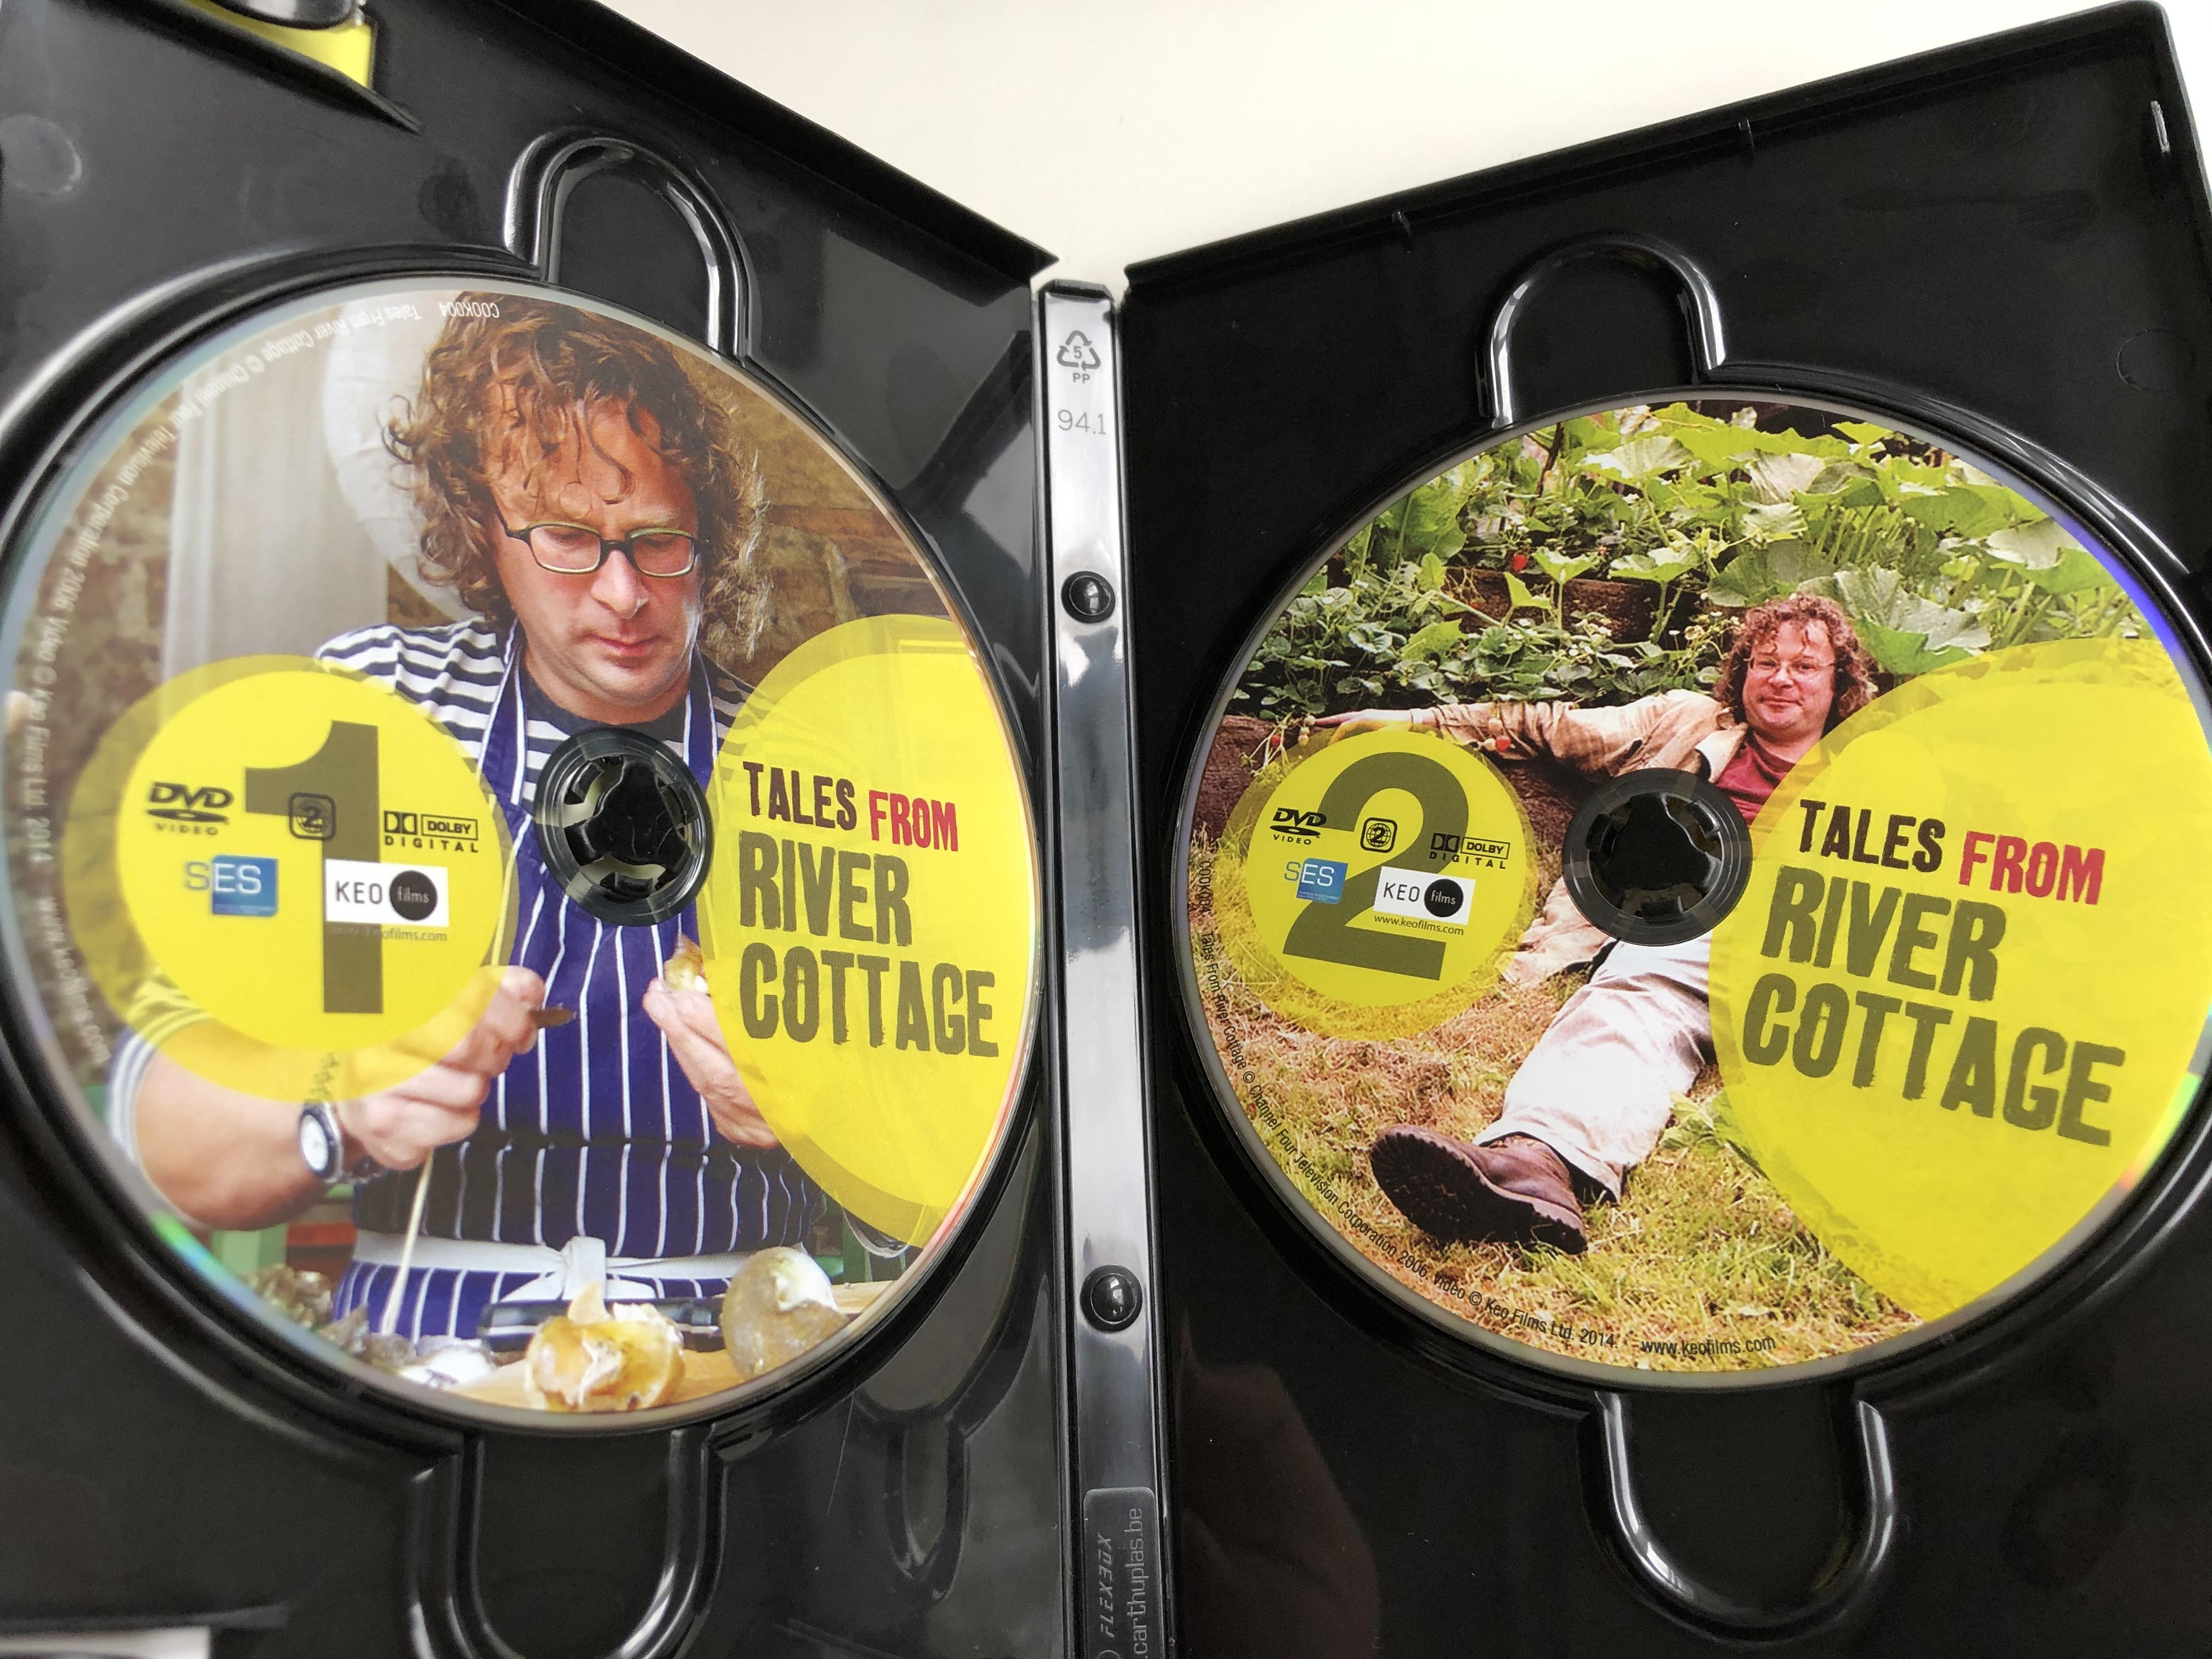 tales-from-river-cottage-dvd-2003-series-directors-zam-baring-garry-john-hughes-andrew-palmer-billy-paulett-2.jpg